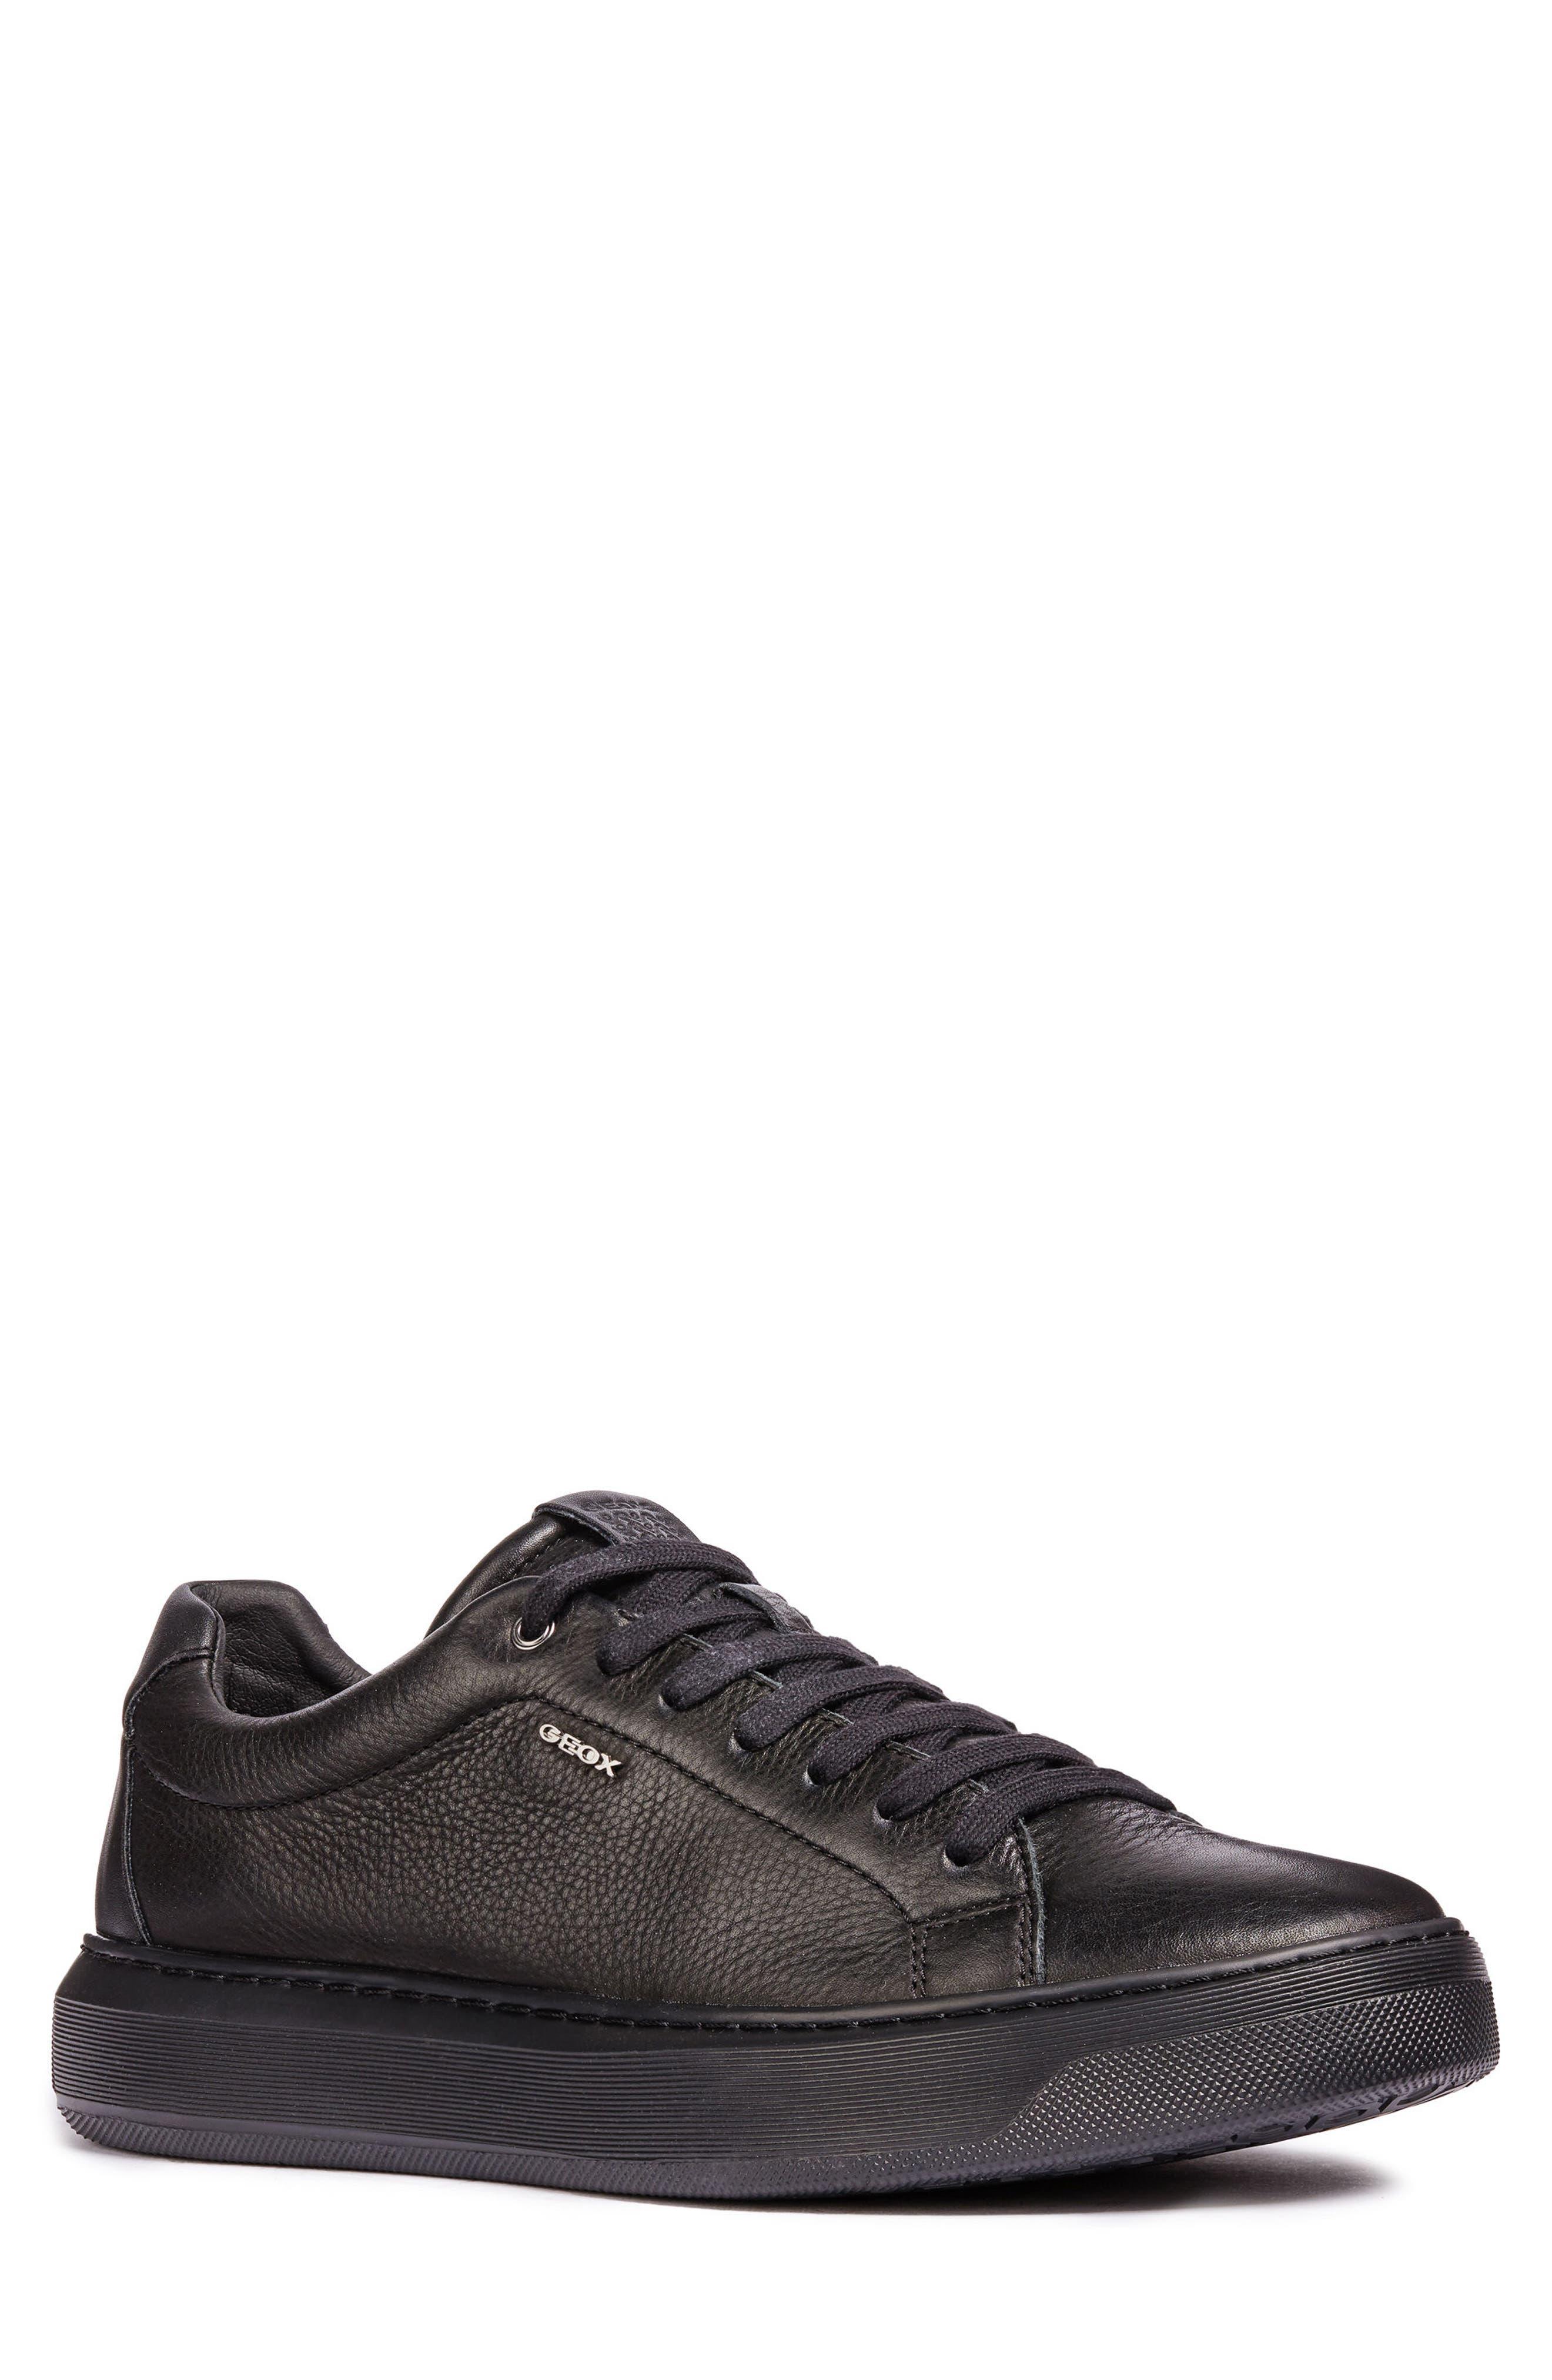 Deiven 4 Low Top Sneaker,                             Main thumbnail 1, color,                             BLACK LEATHER